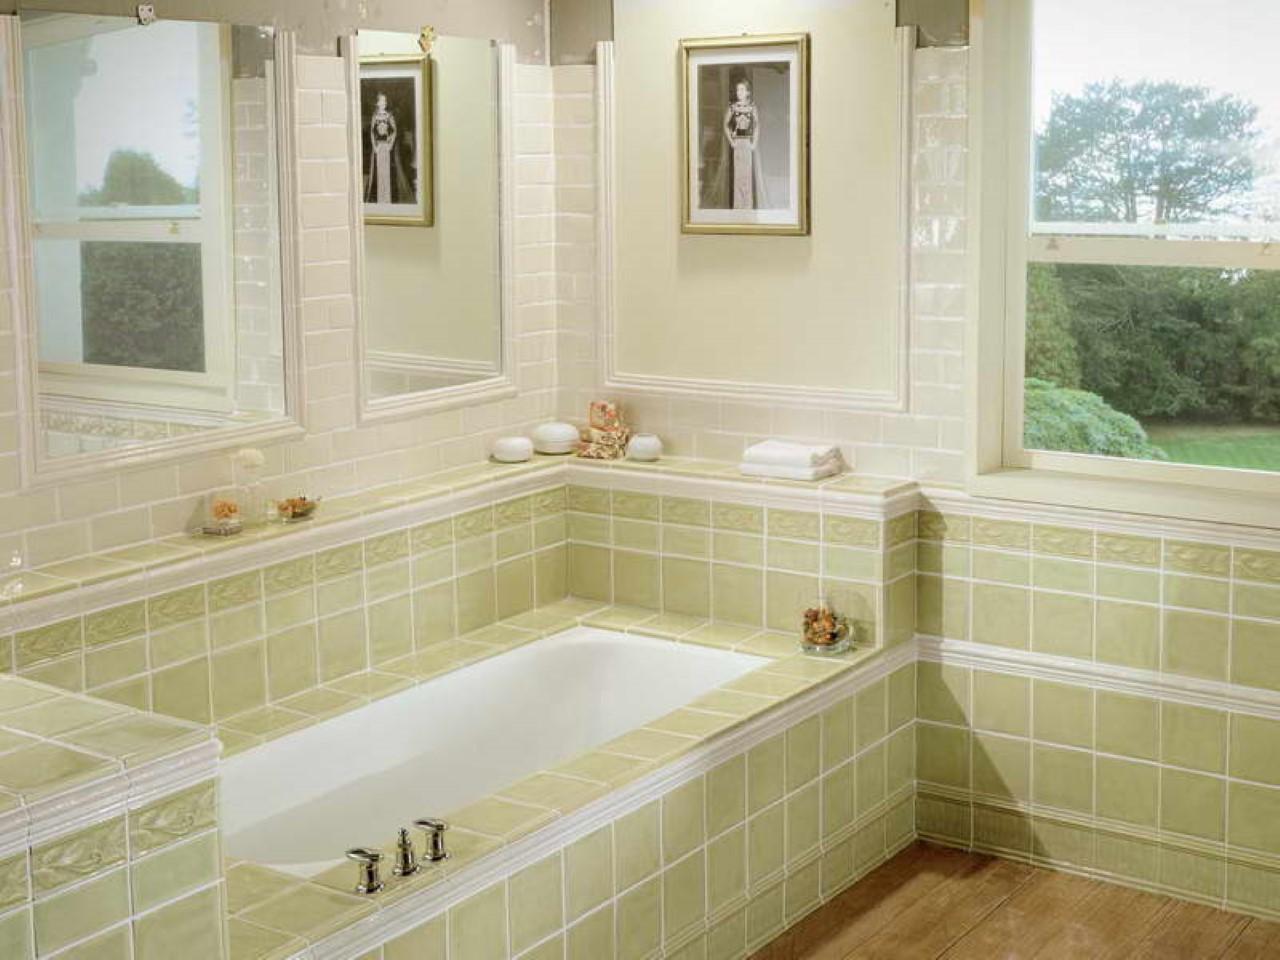 The Best Tub Ideas for Small Bathroom Design | HomesFeed